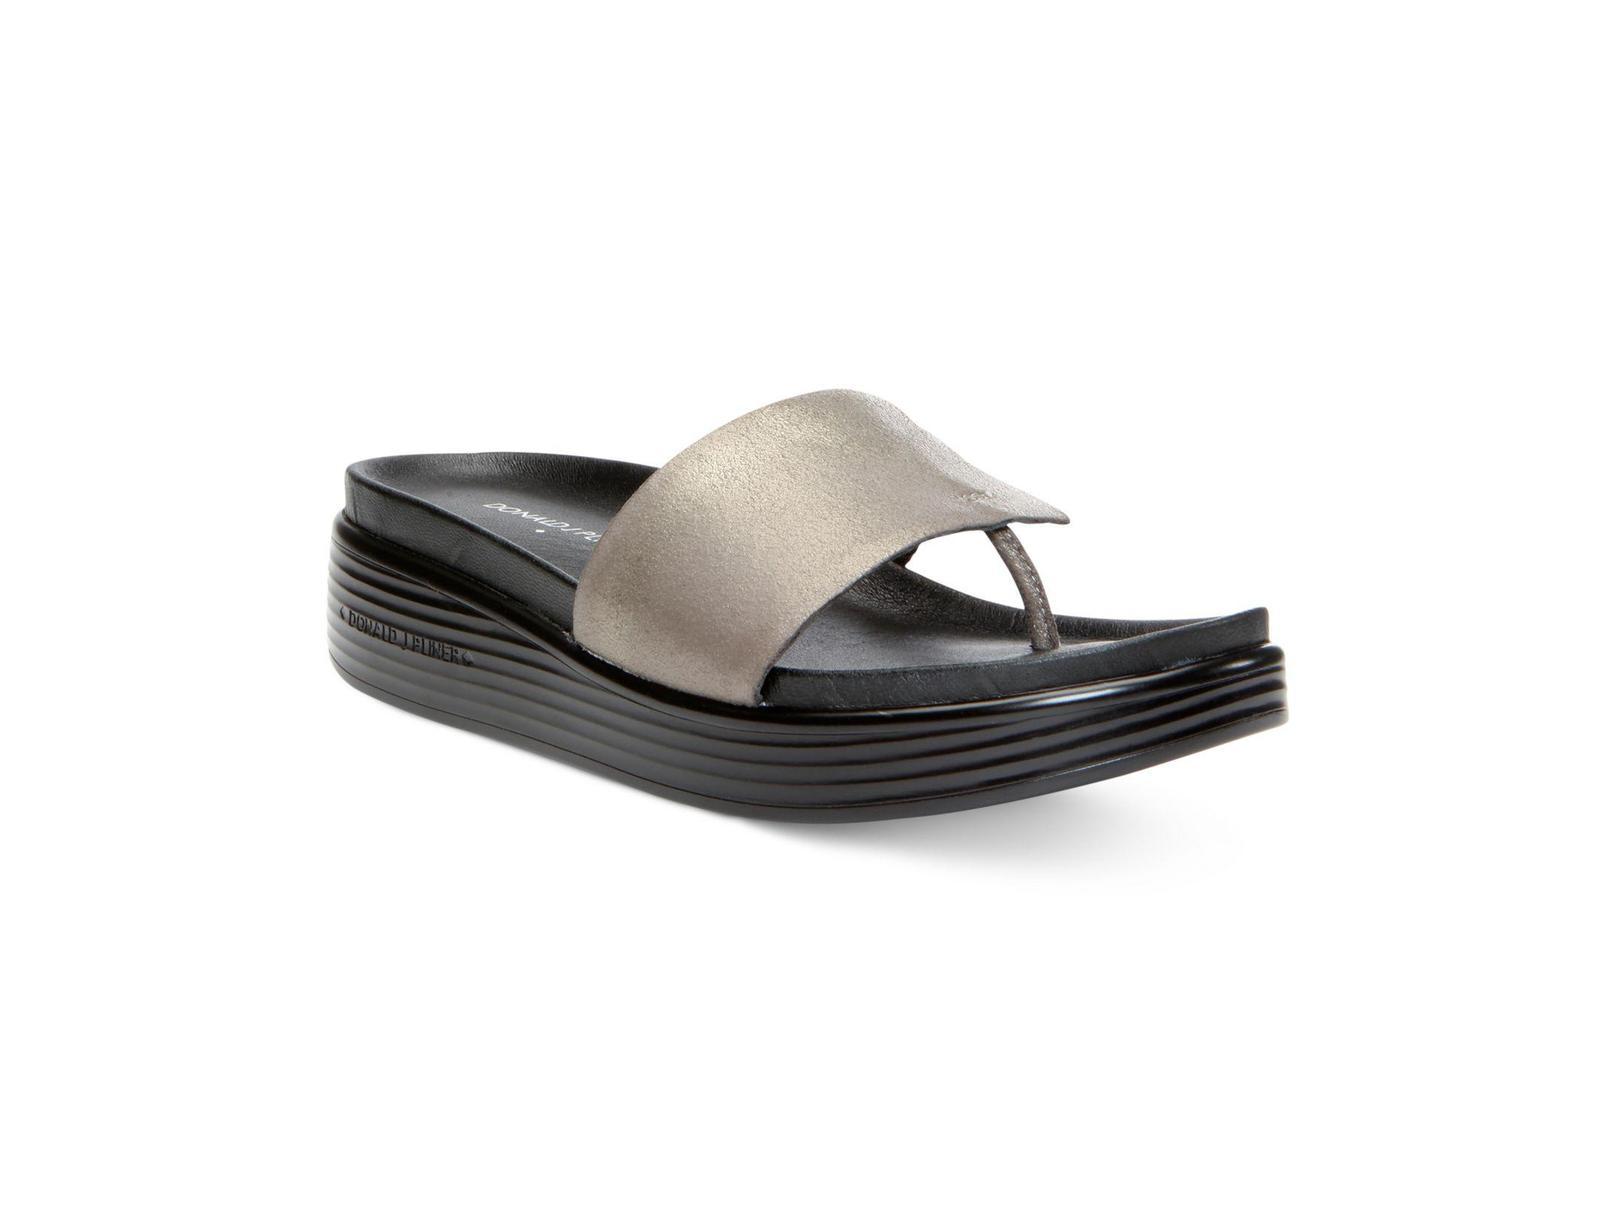 9f8ed117482 Donald J Pliner Womens Fifi Leather Open Toe Casual Platform